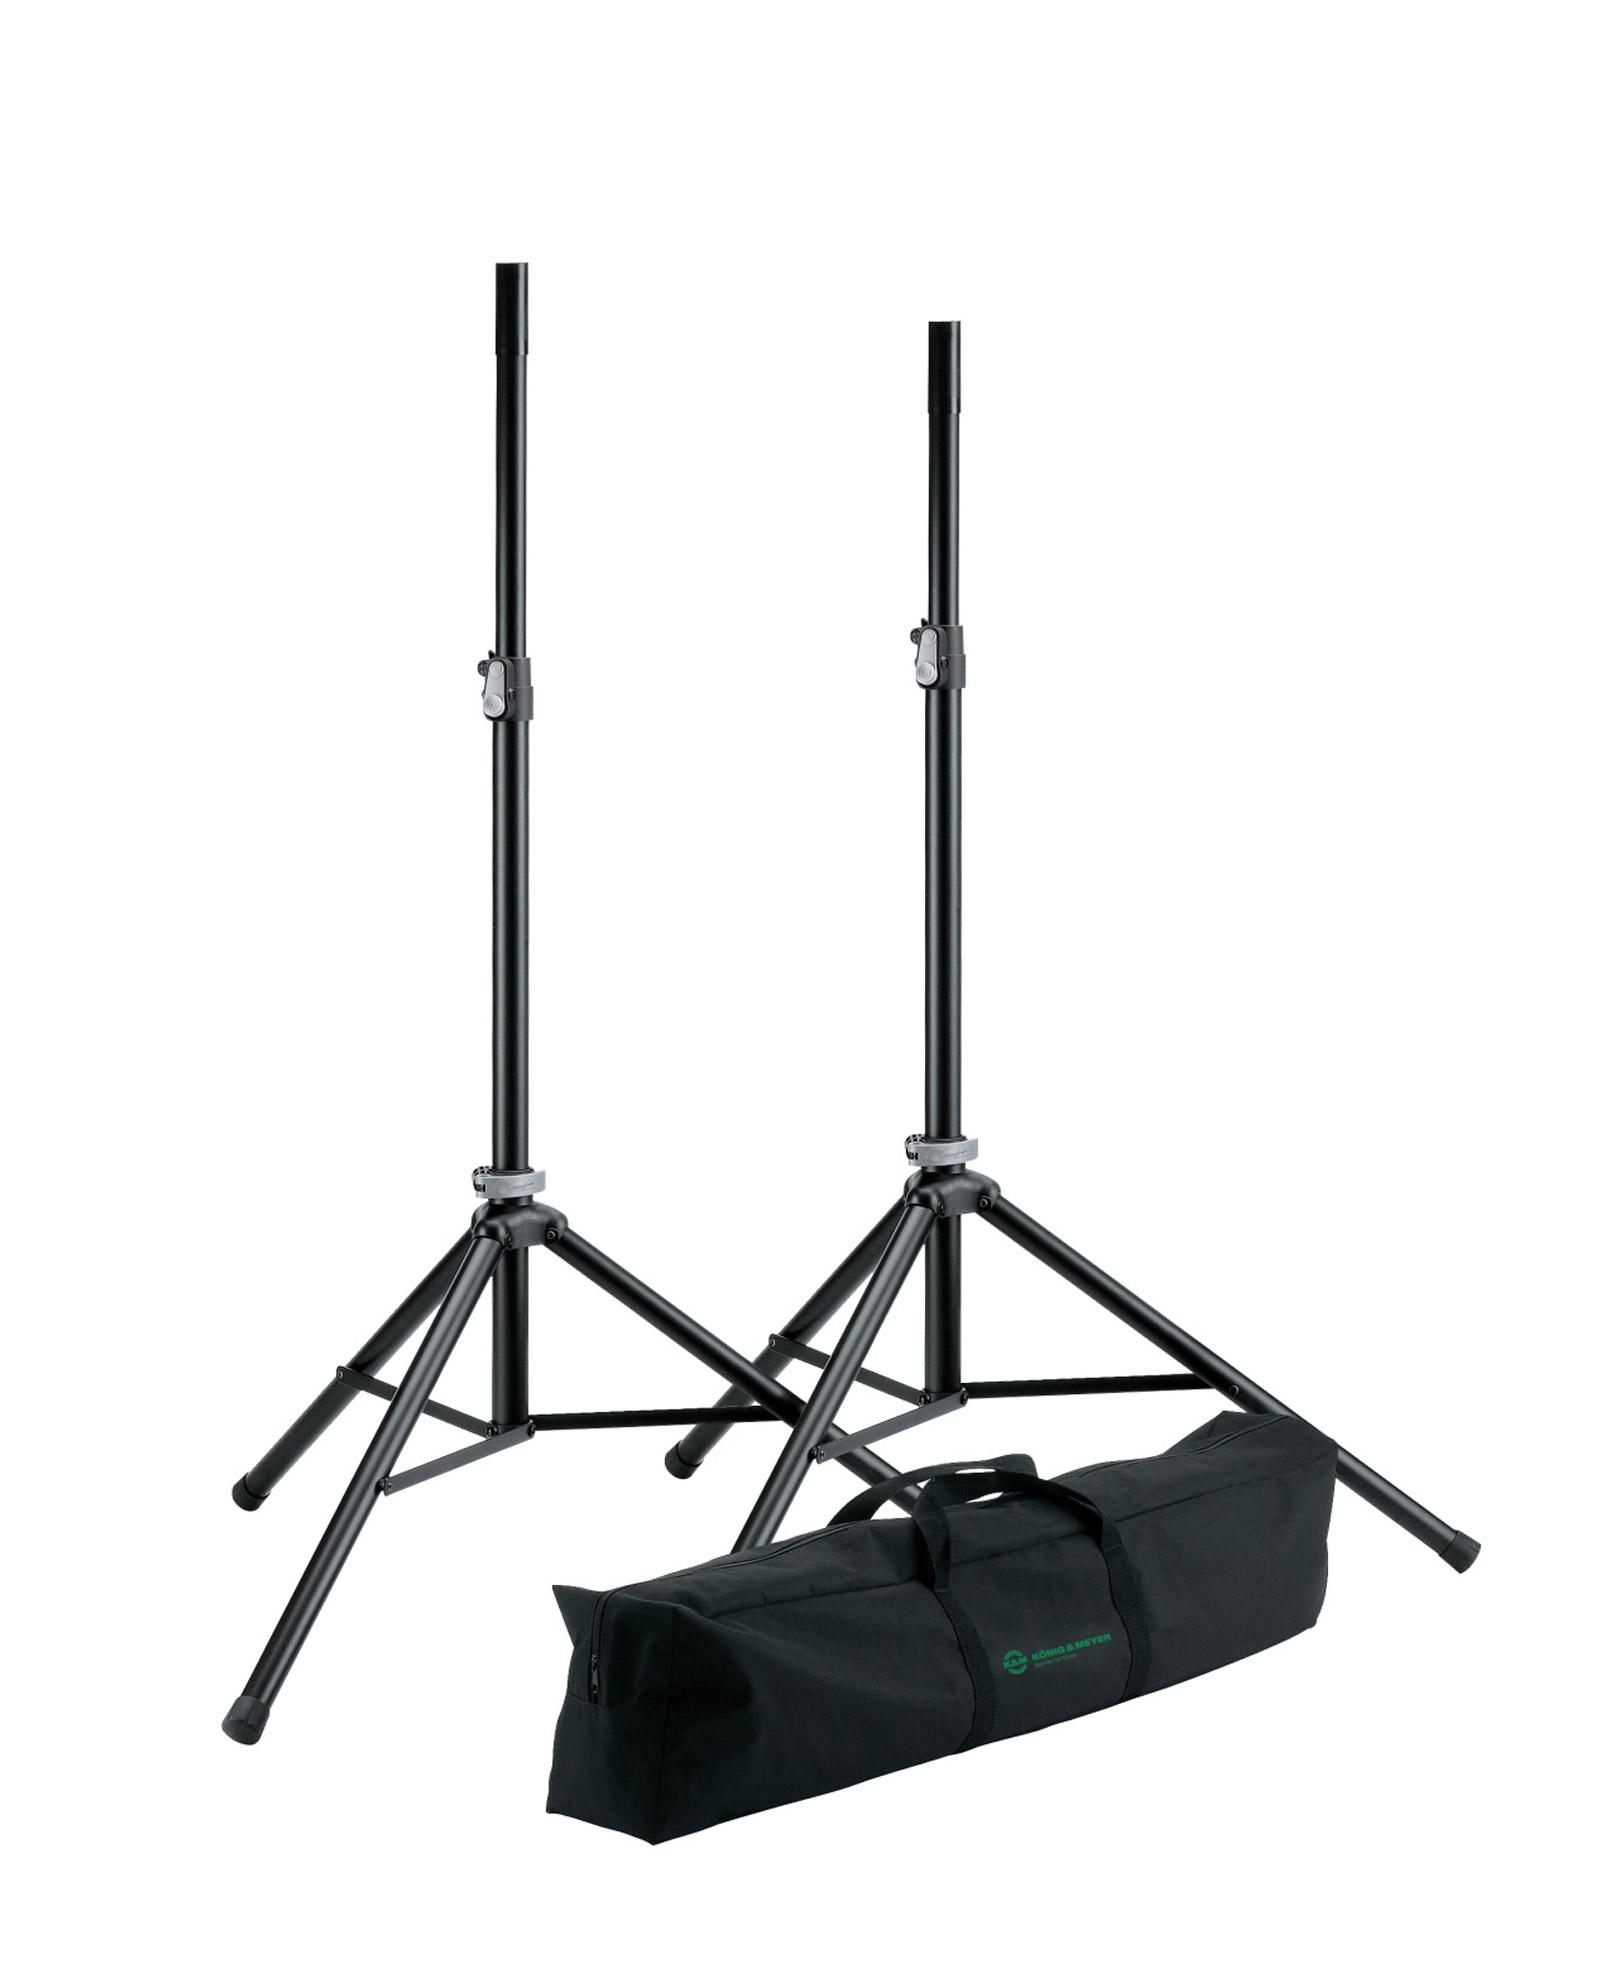 K&m 21449 Speaker Stand Package